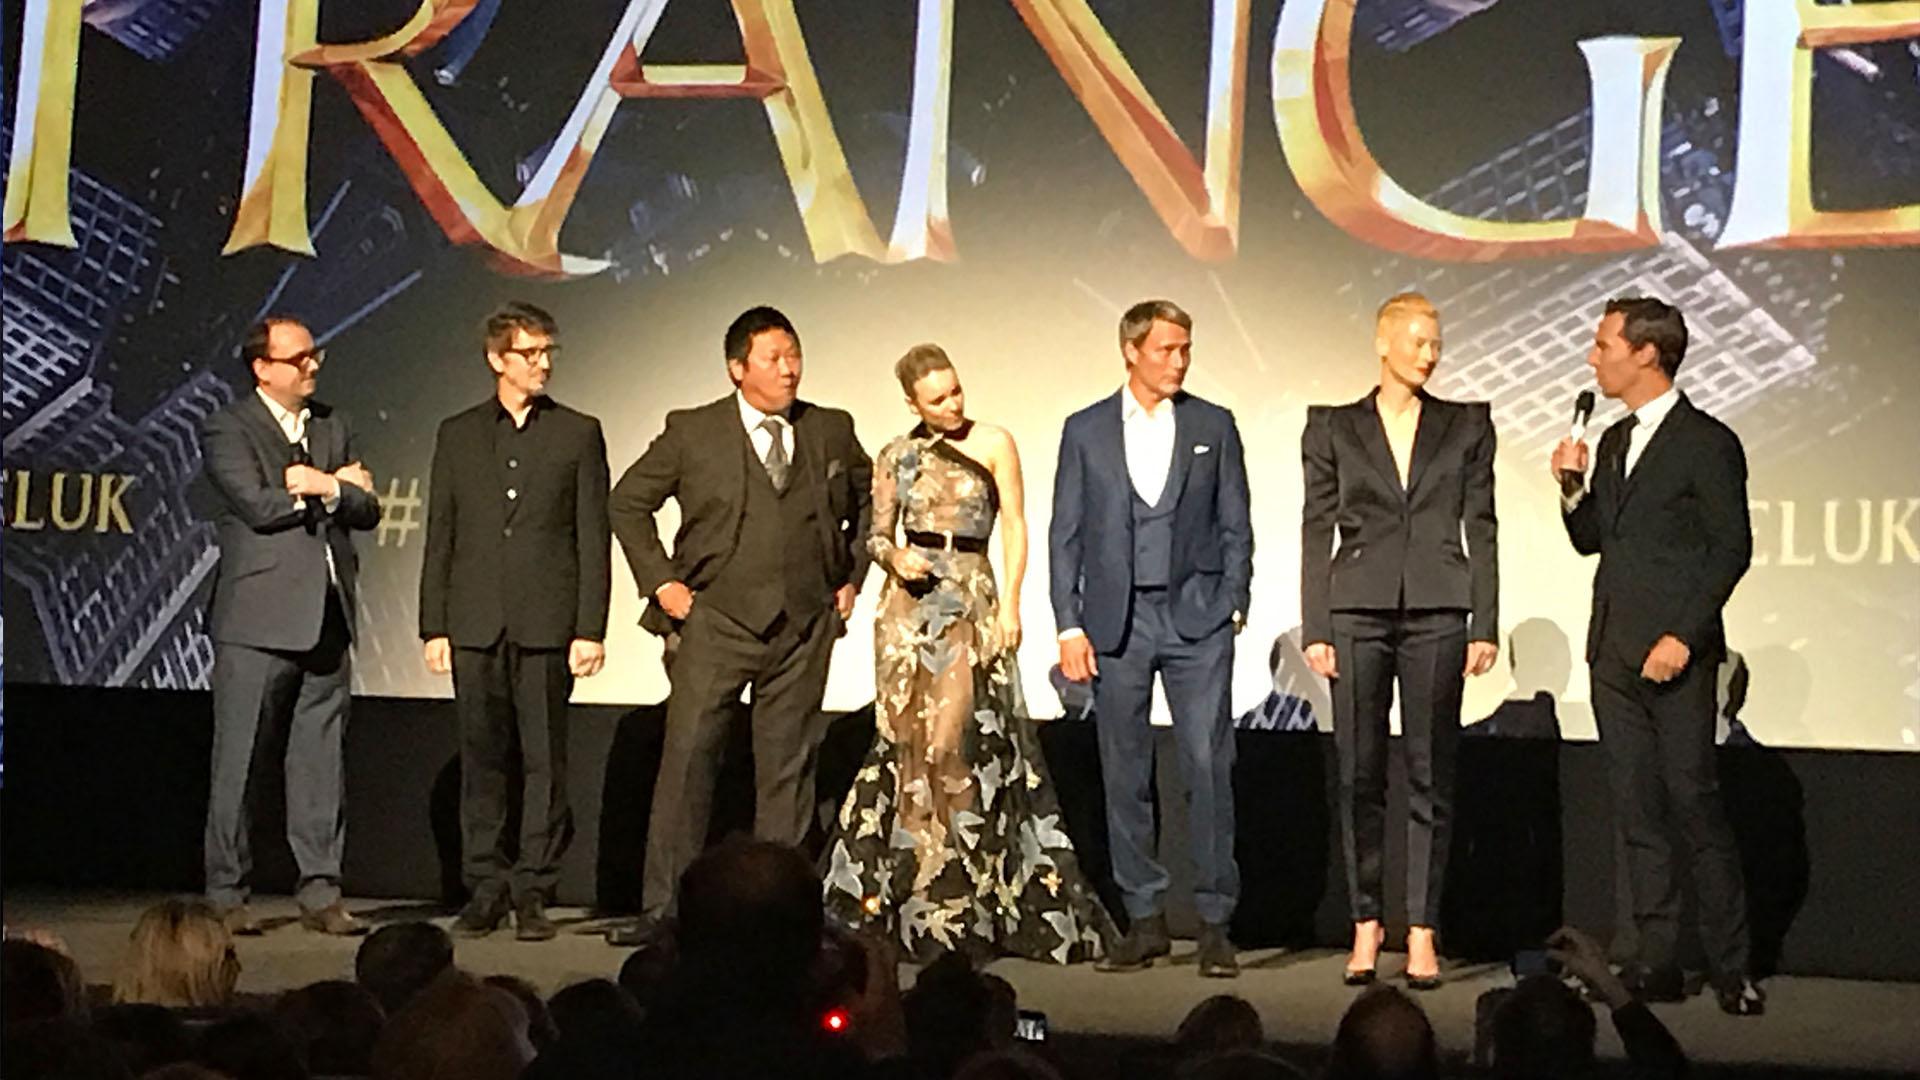 Scott Derrikson, Benedict Wong, Rachel McAdams, Mads Mikkelson, Tilda Swinton and Benedict Cumberbatch at the UK Premiere of Doctor Strange